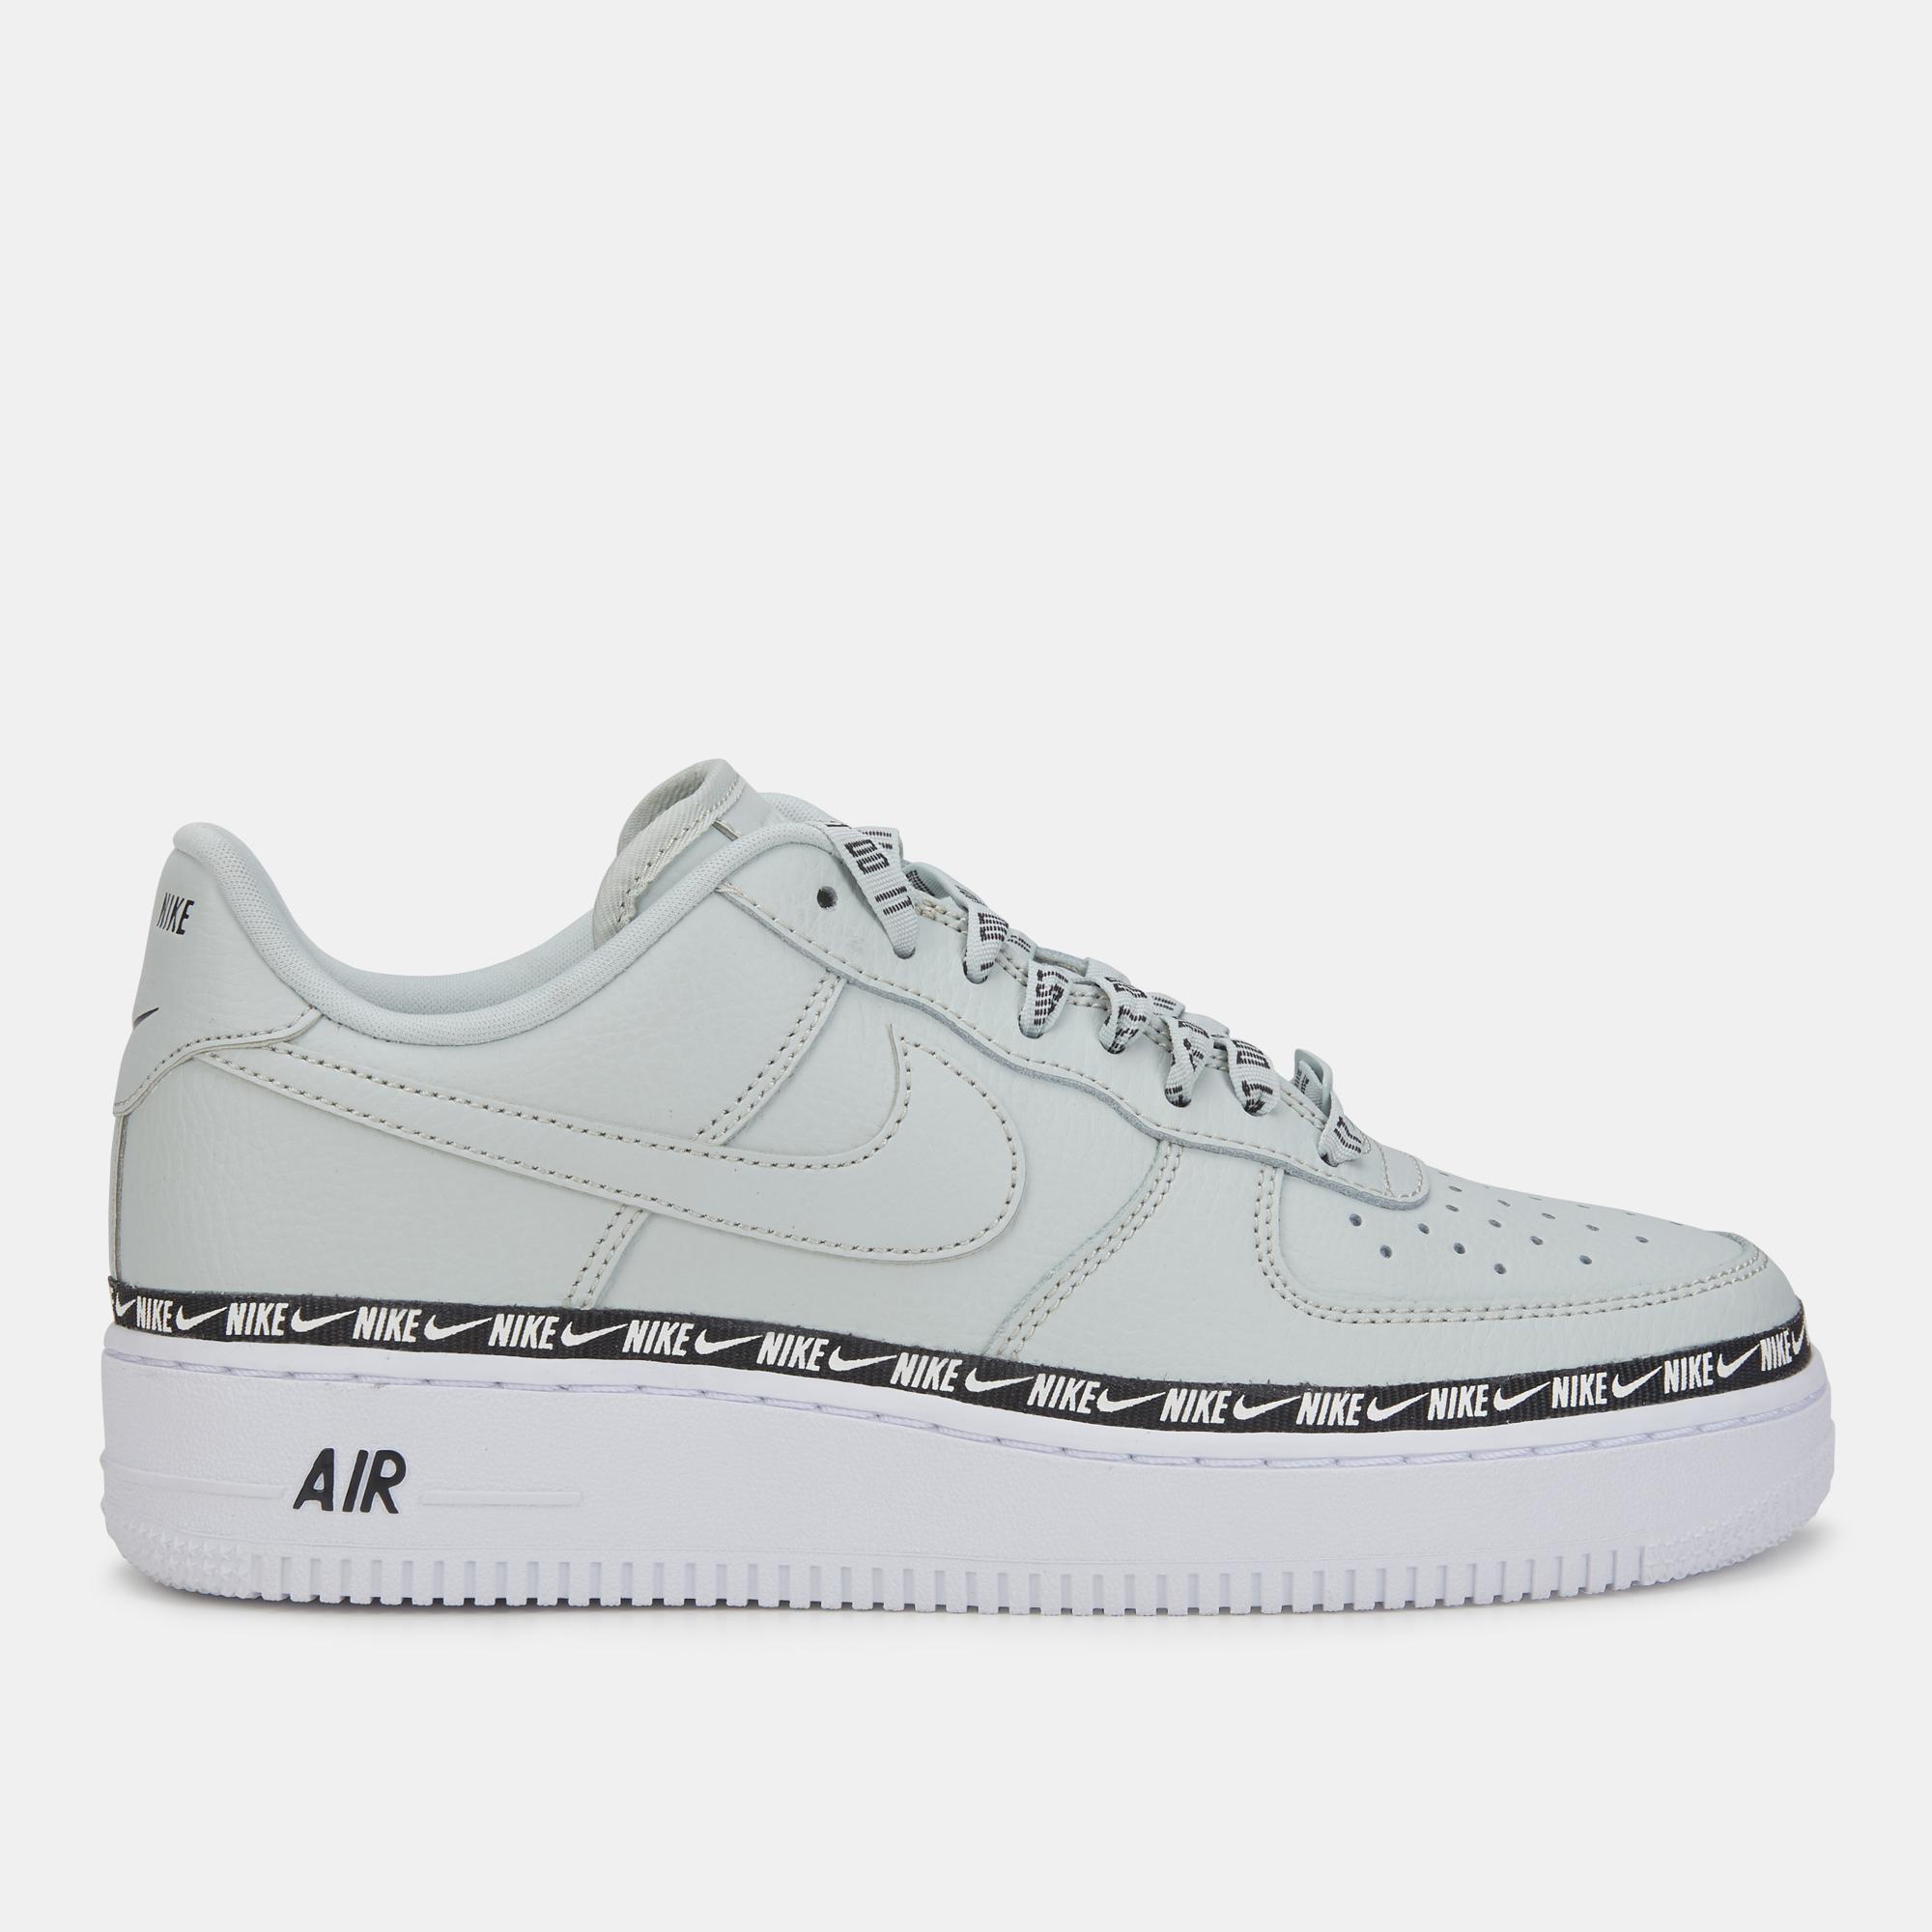 Nike Air Force 1 '07 SE Premium Shoe | Sneakers | Shoes ...